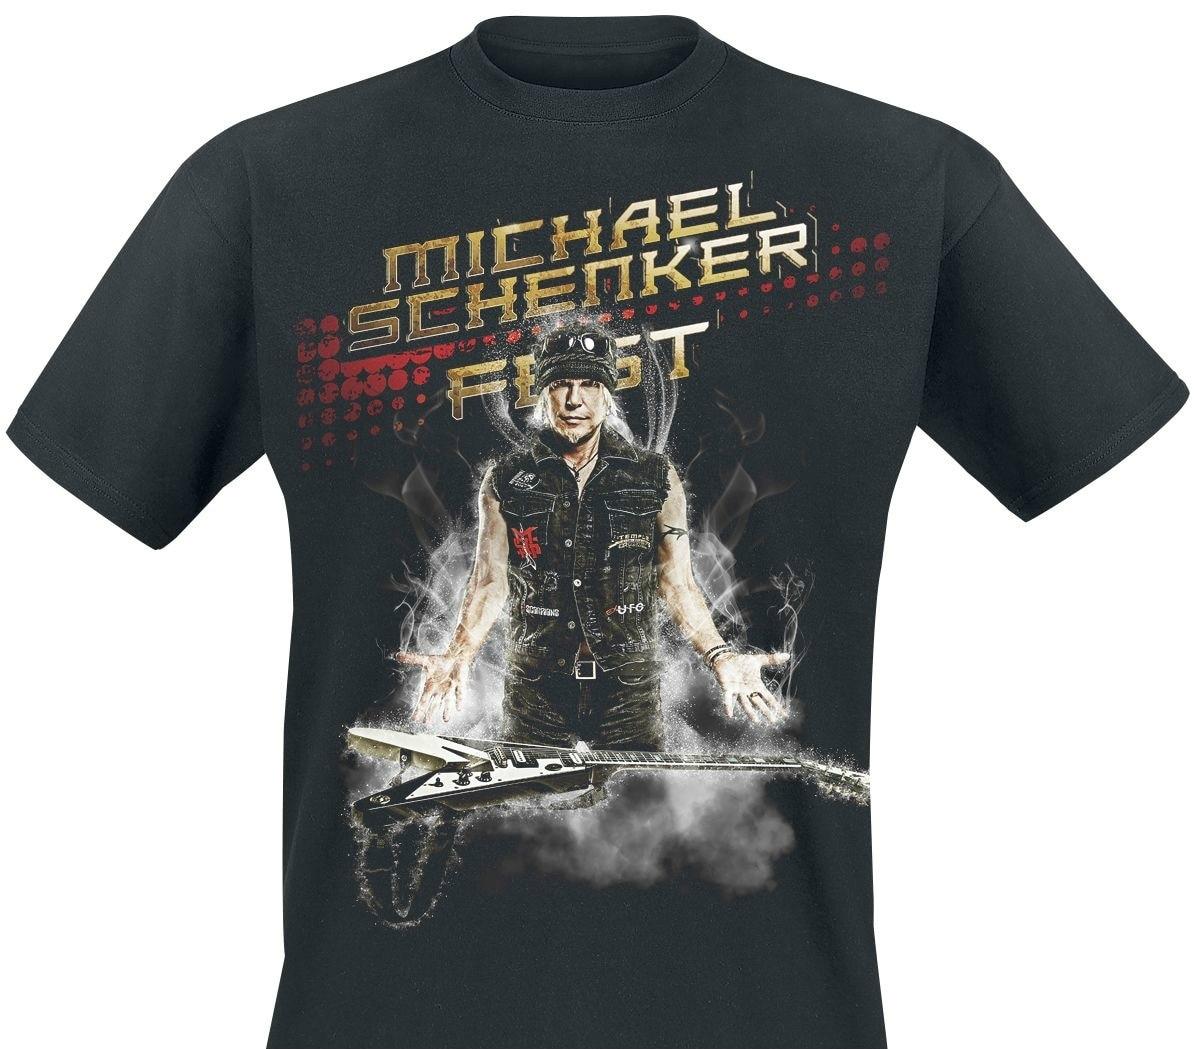 Camiseta masculina alemão wunderkind michael schenker fest engraçado t camisa novidade tshirt feminino